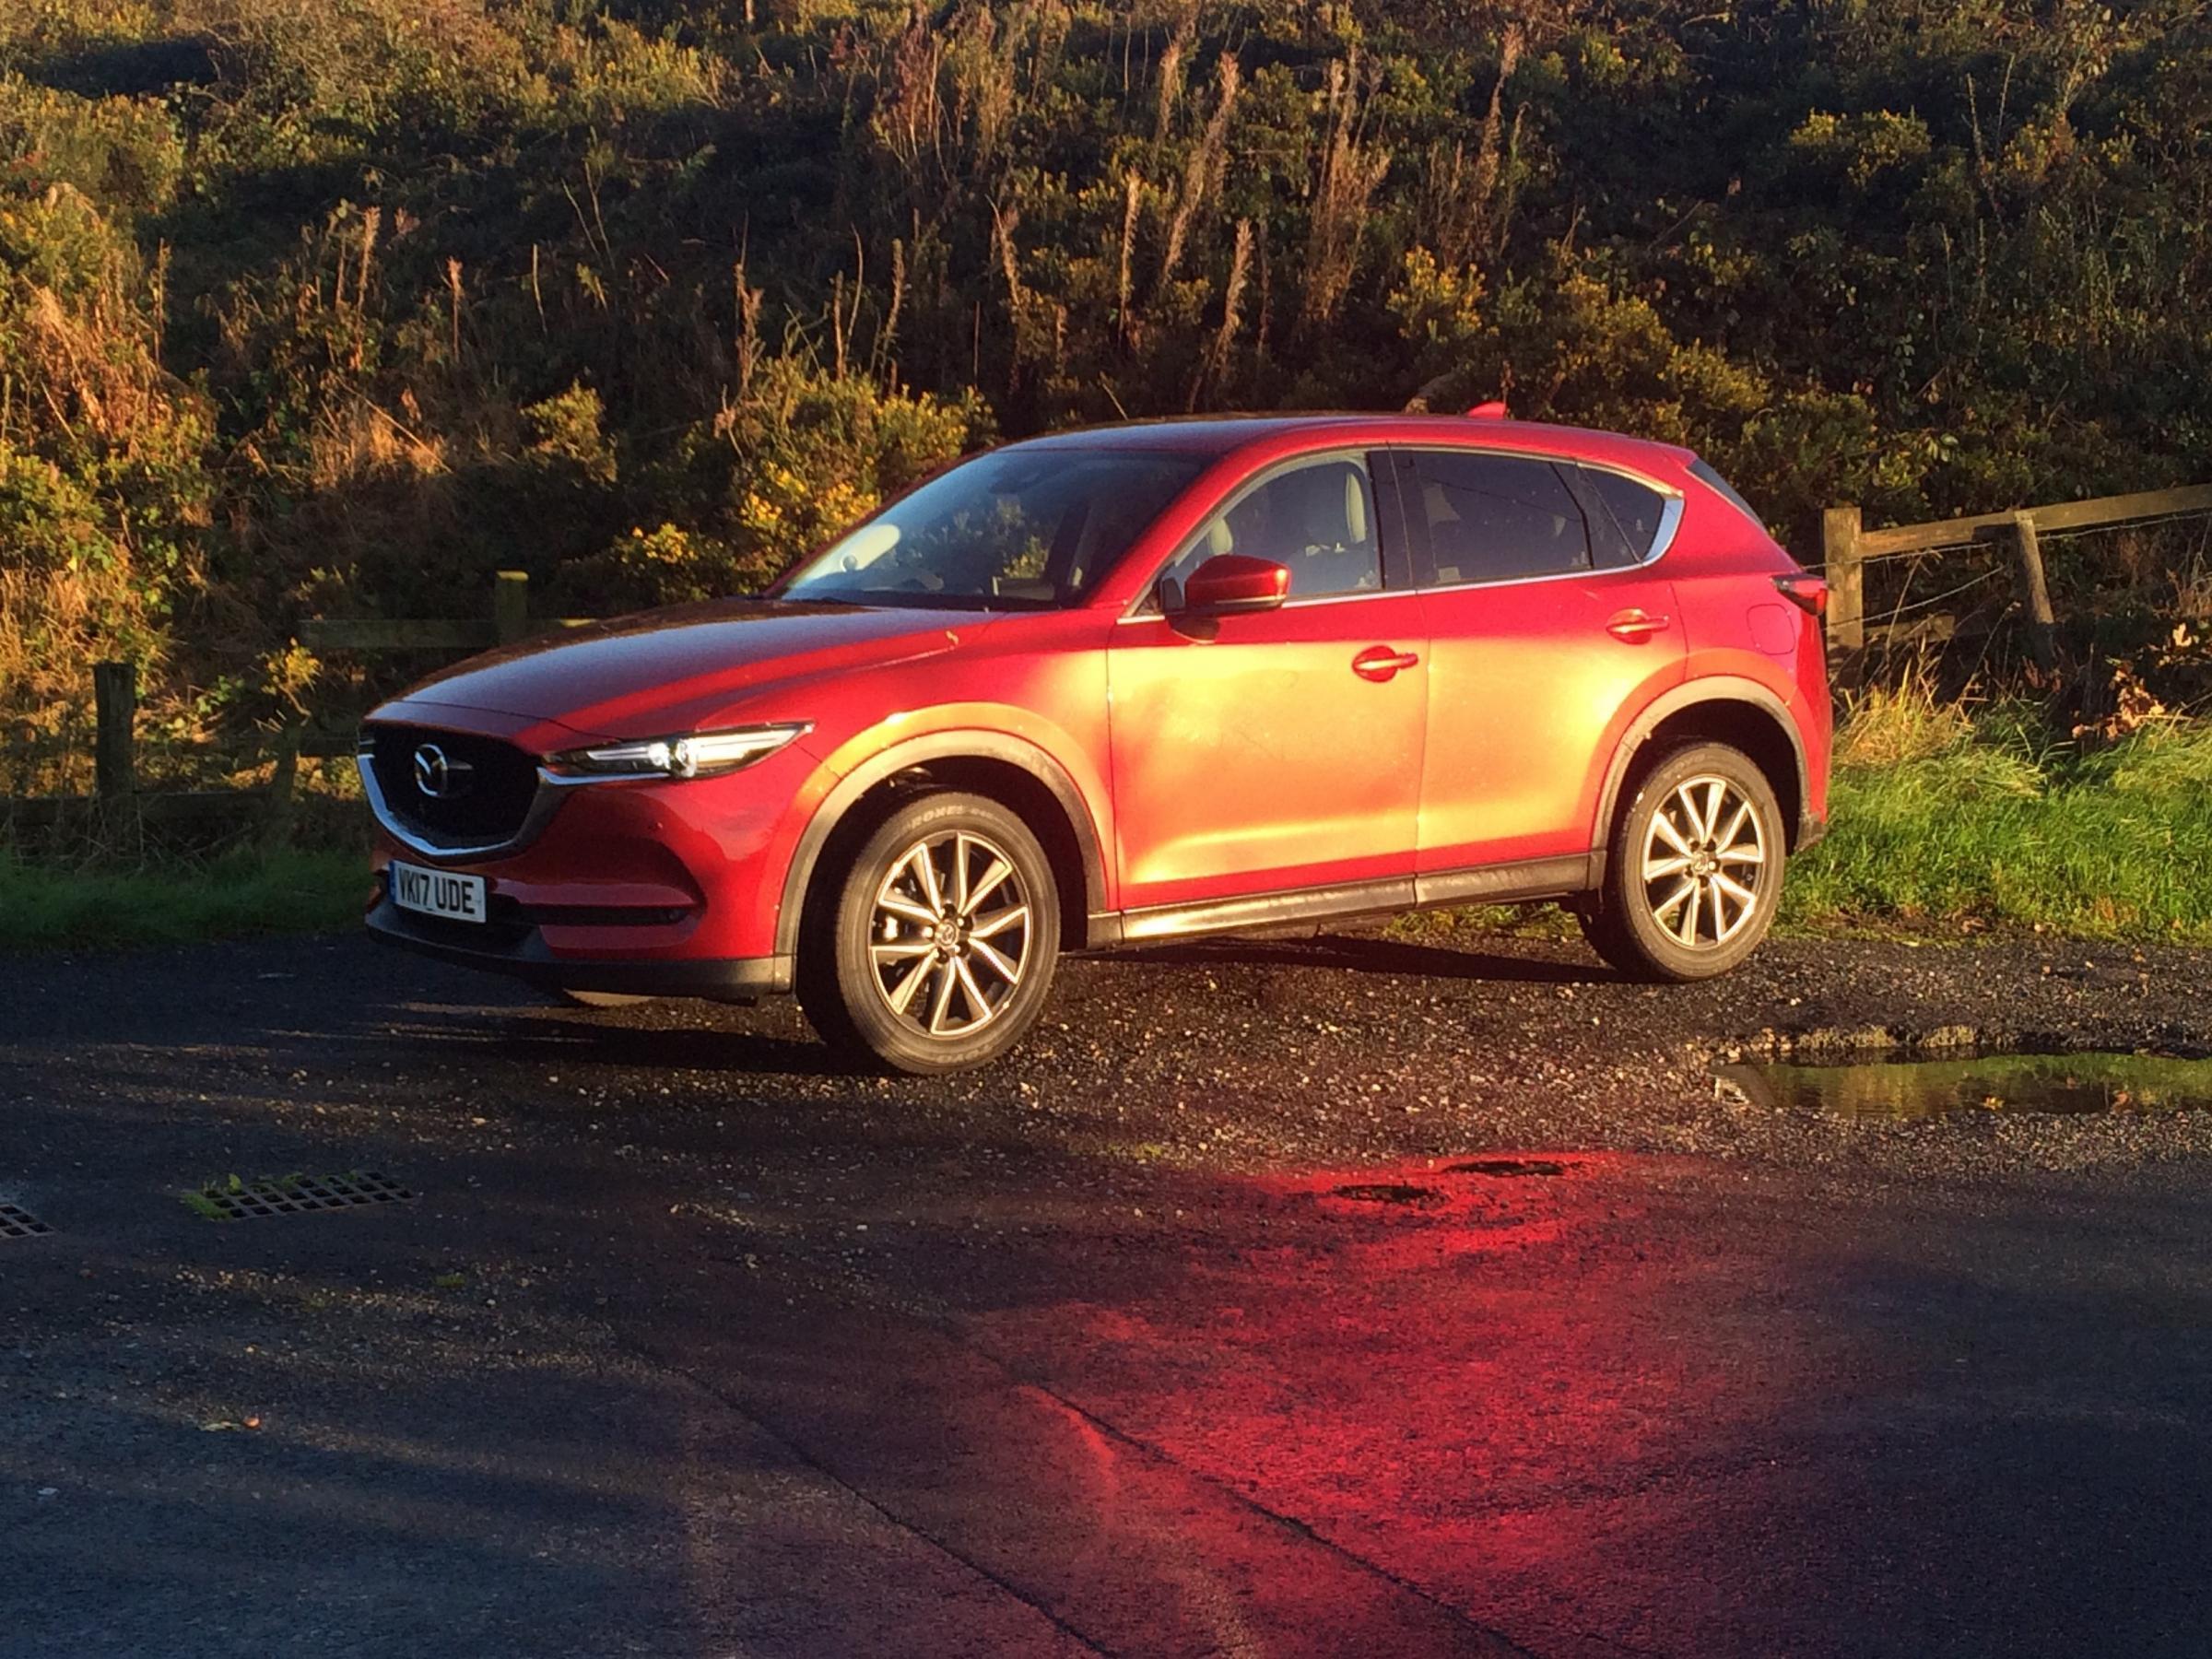 CAR REVIEW: Mazda CX 5